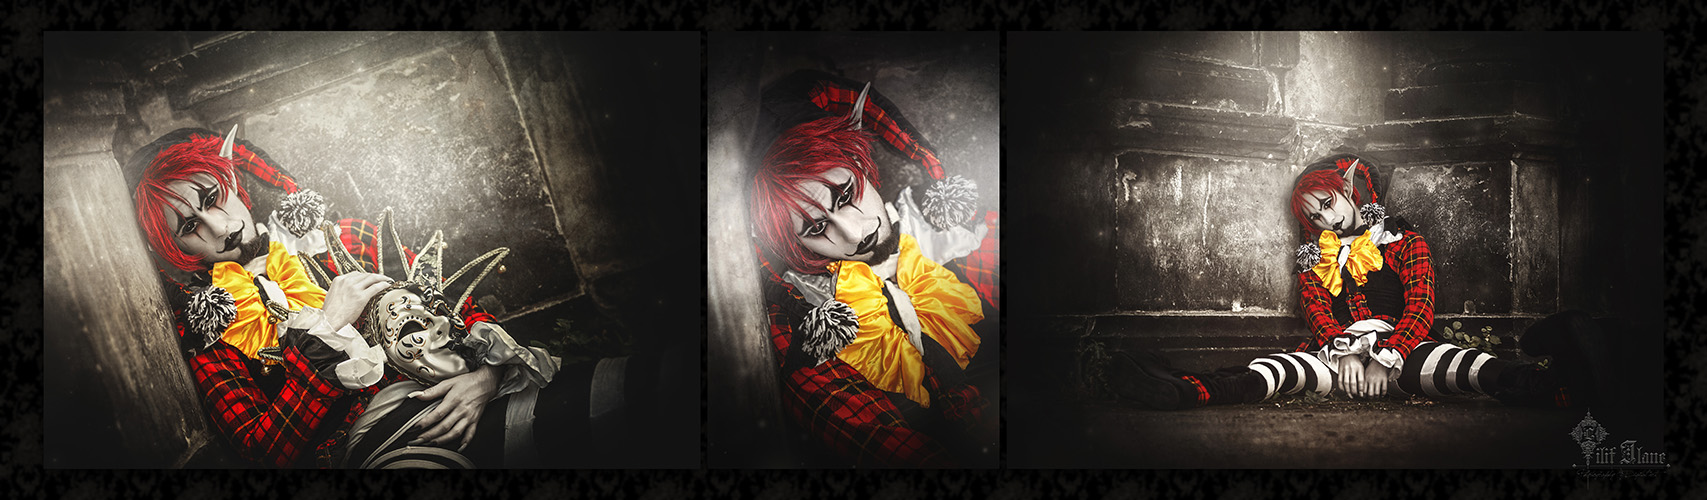 sad clown by LilifIlane